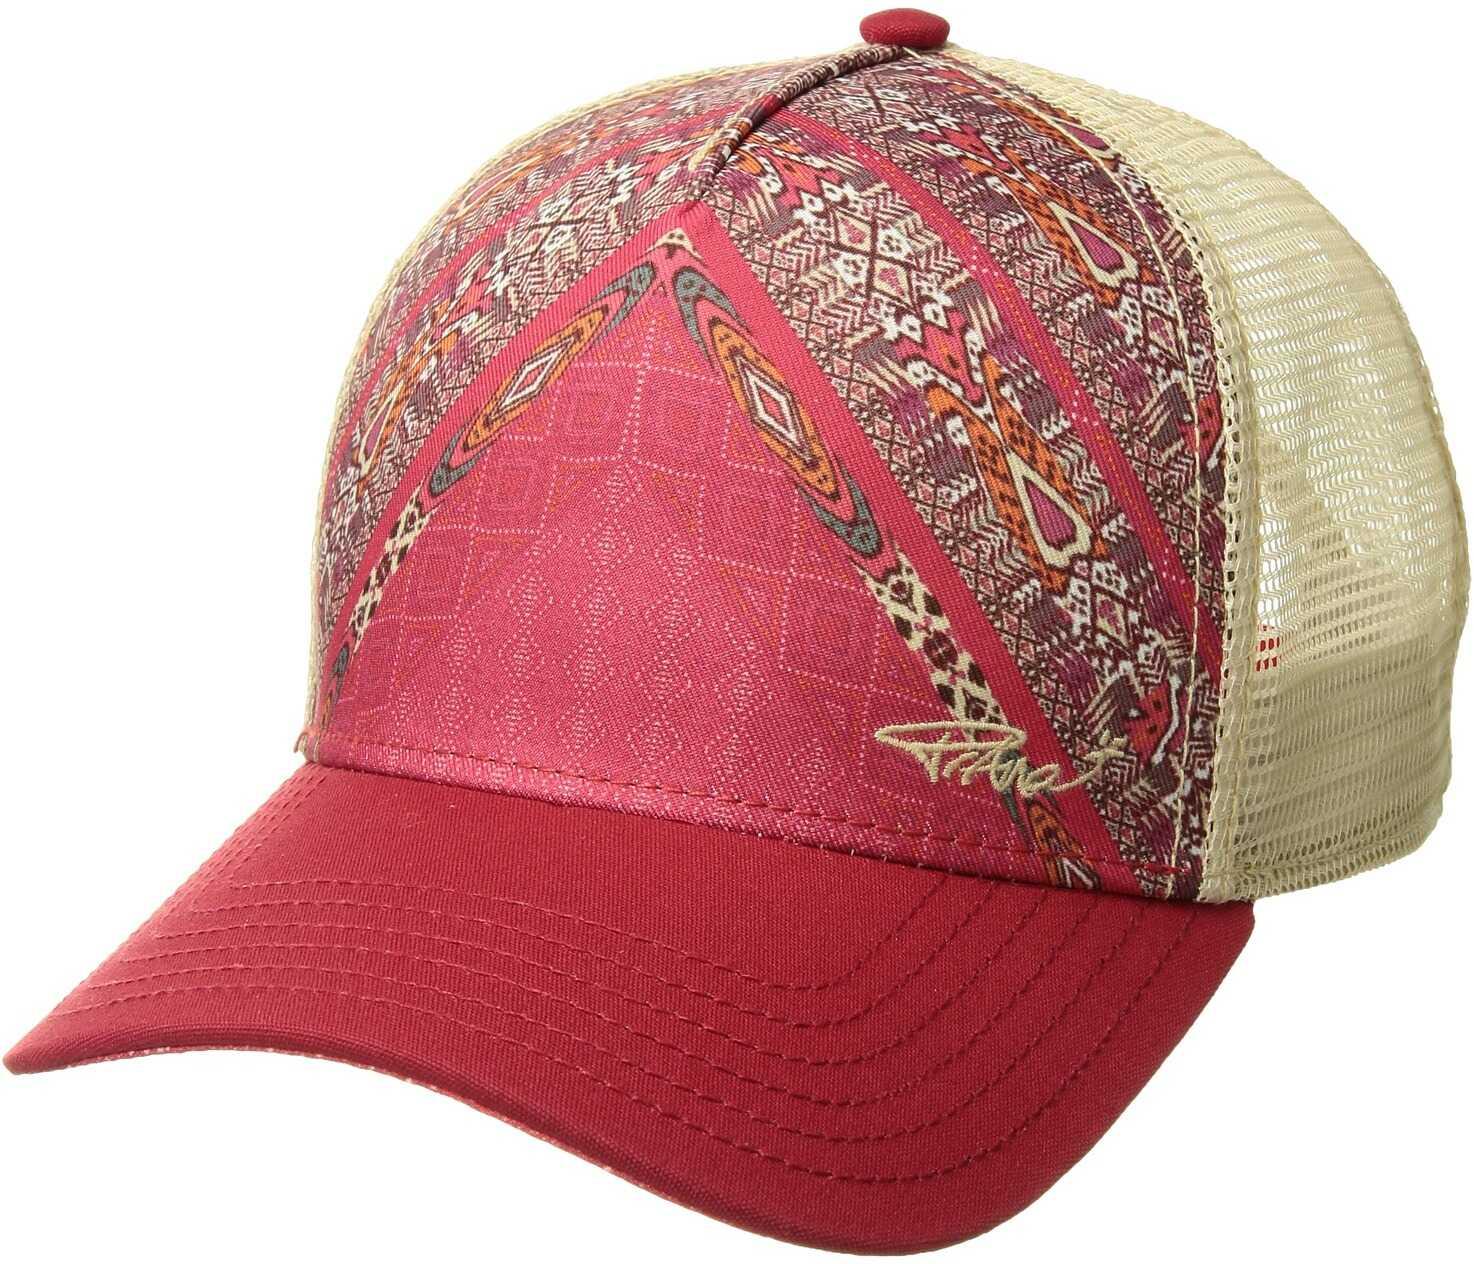 Prana La Viva Trucker Hat Carmine Pink Marrakesh